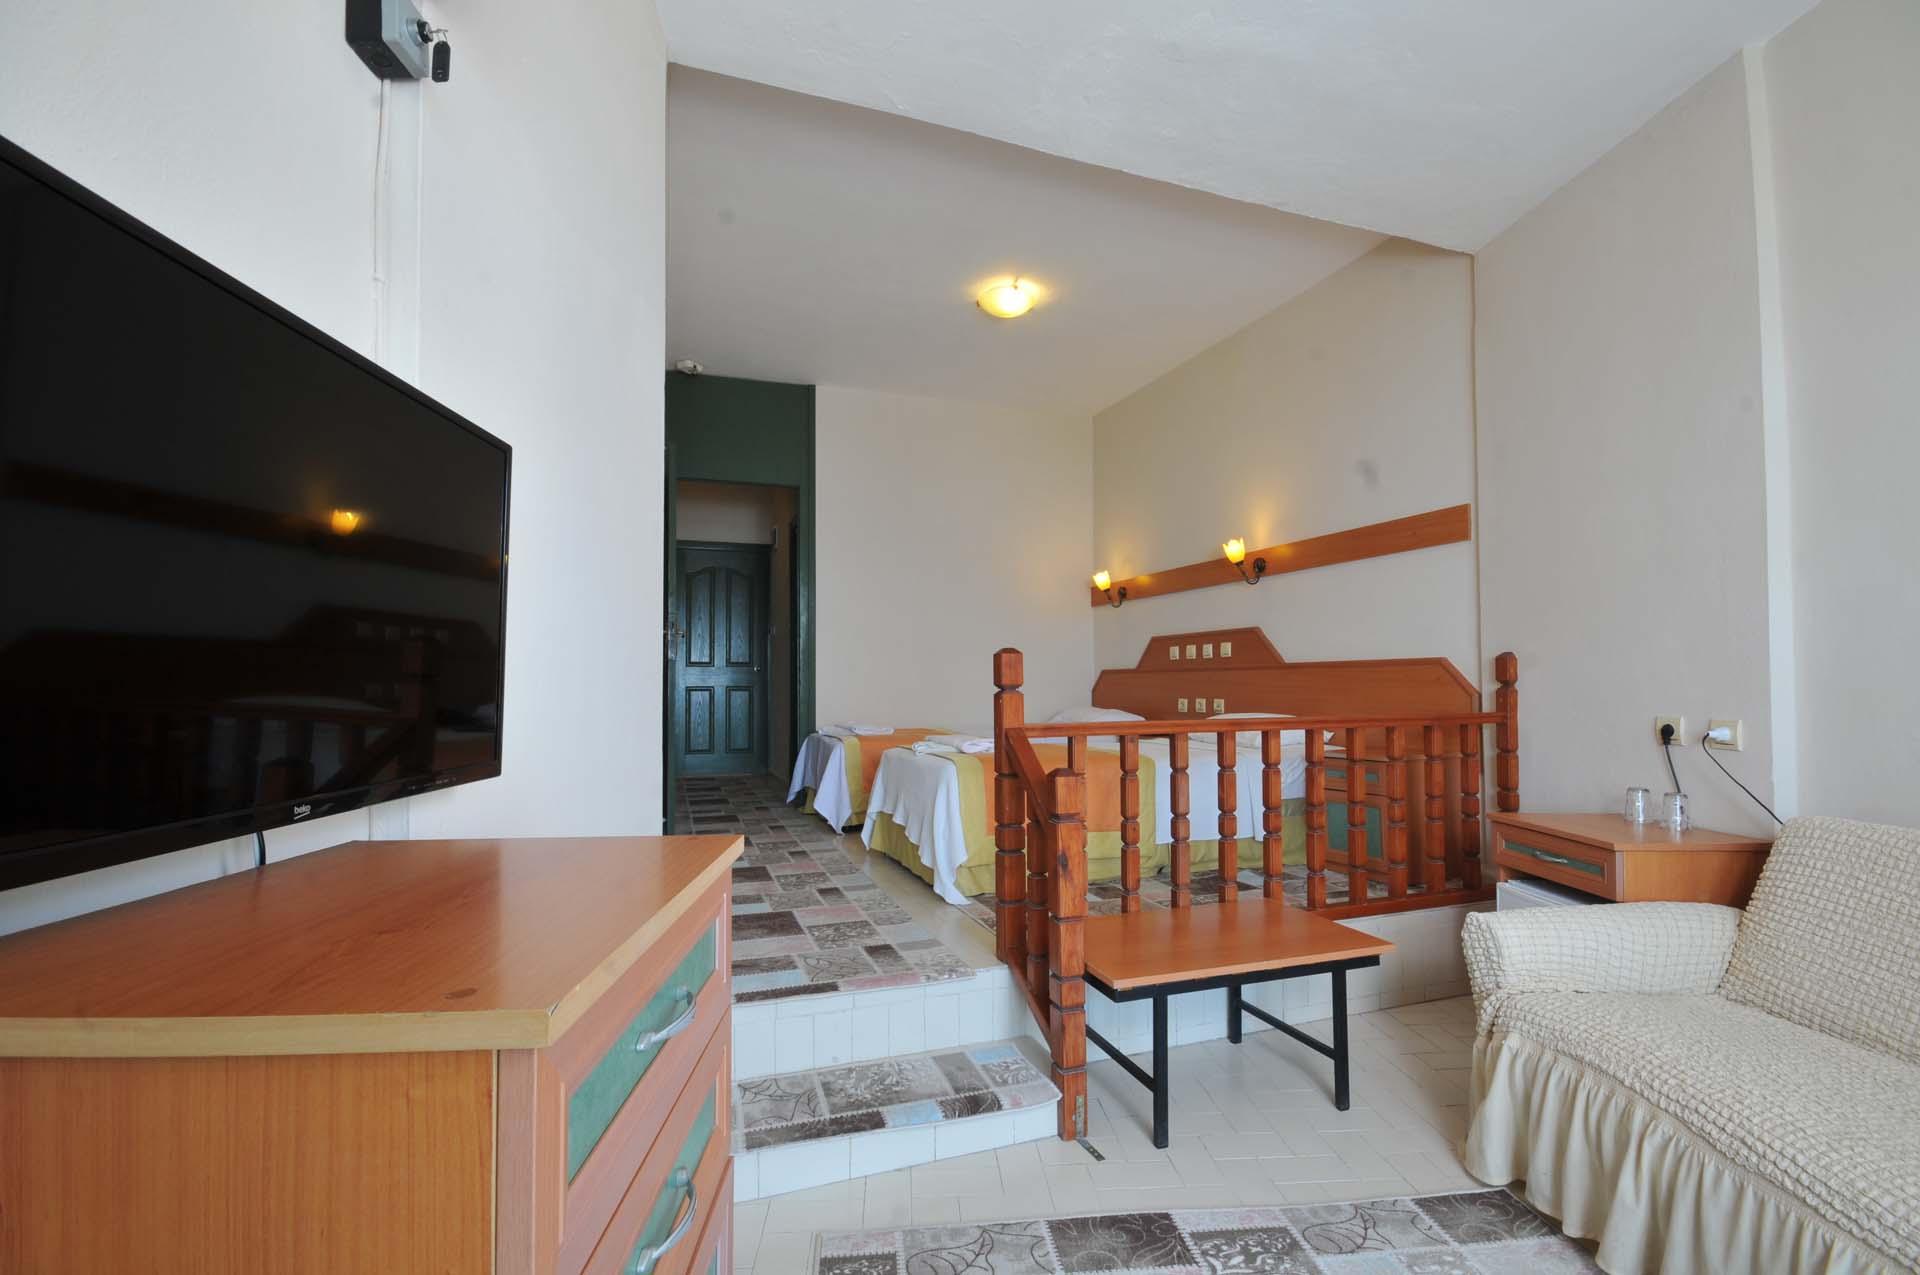 Letovanje Turska autobusom, Marmaris,Hotel Amos Marmaris izgled sobe